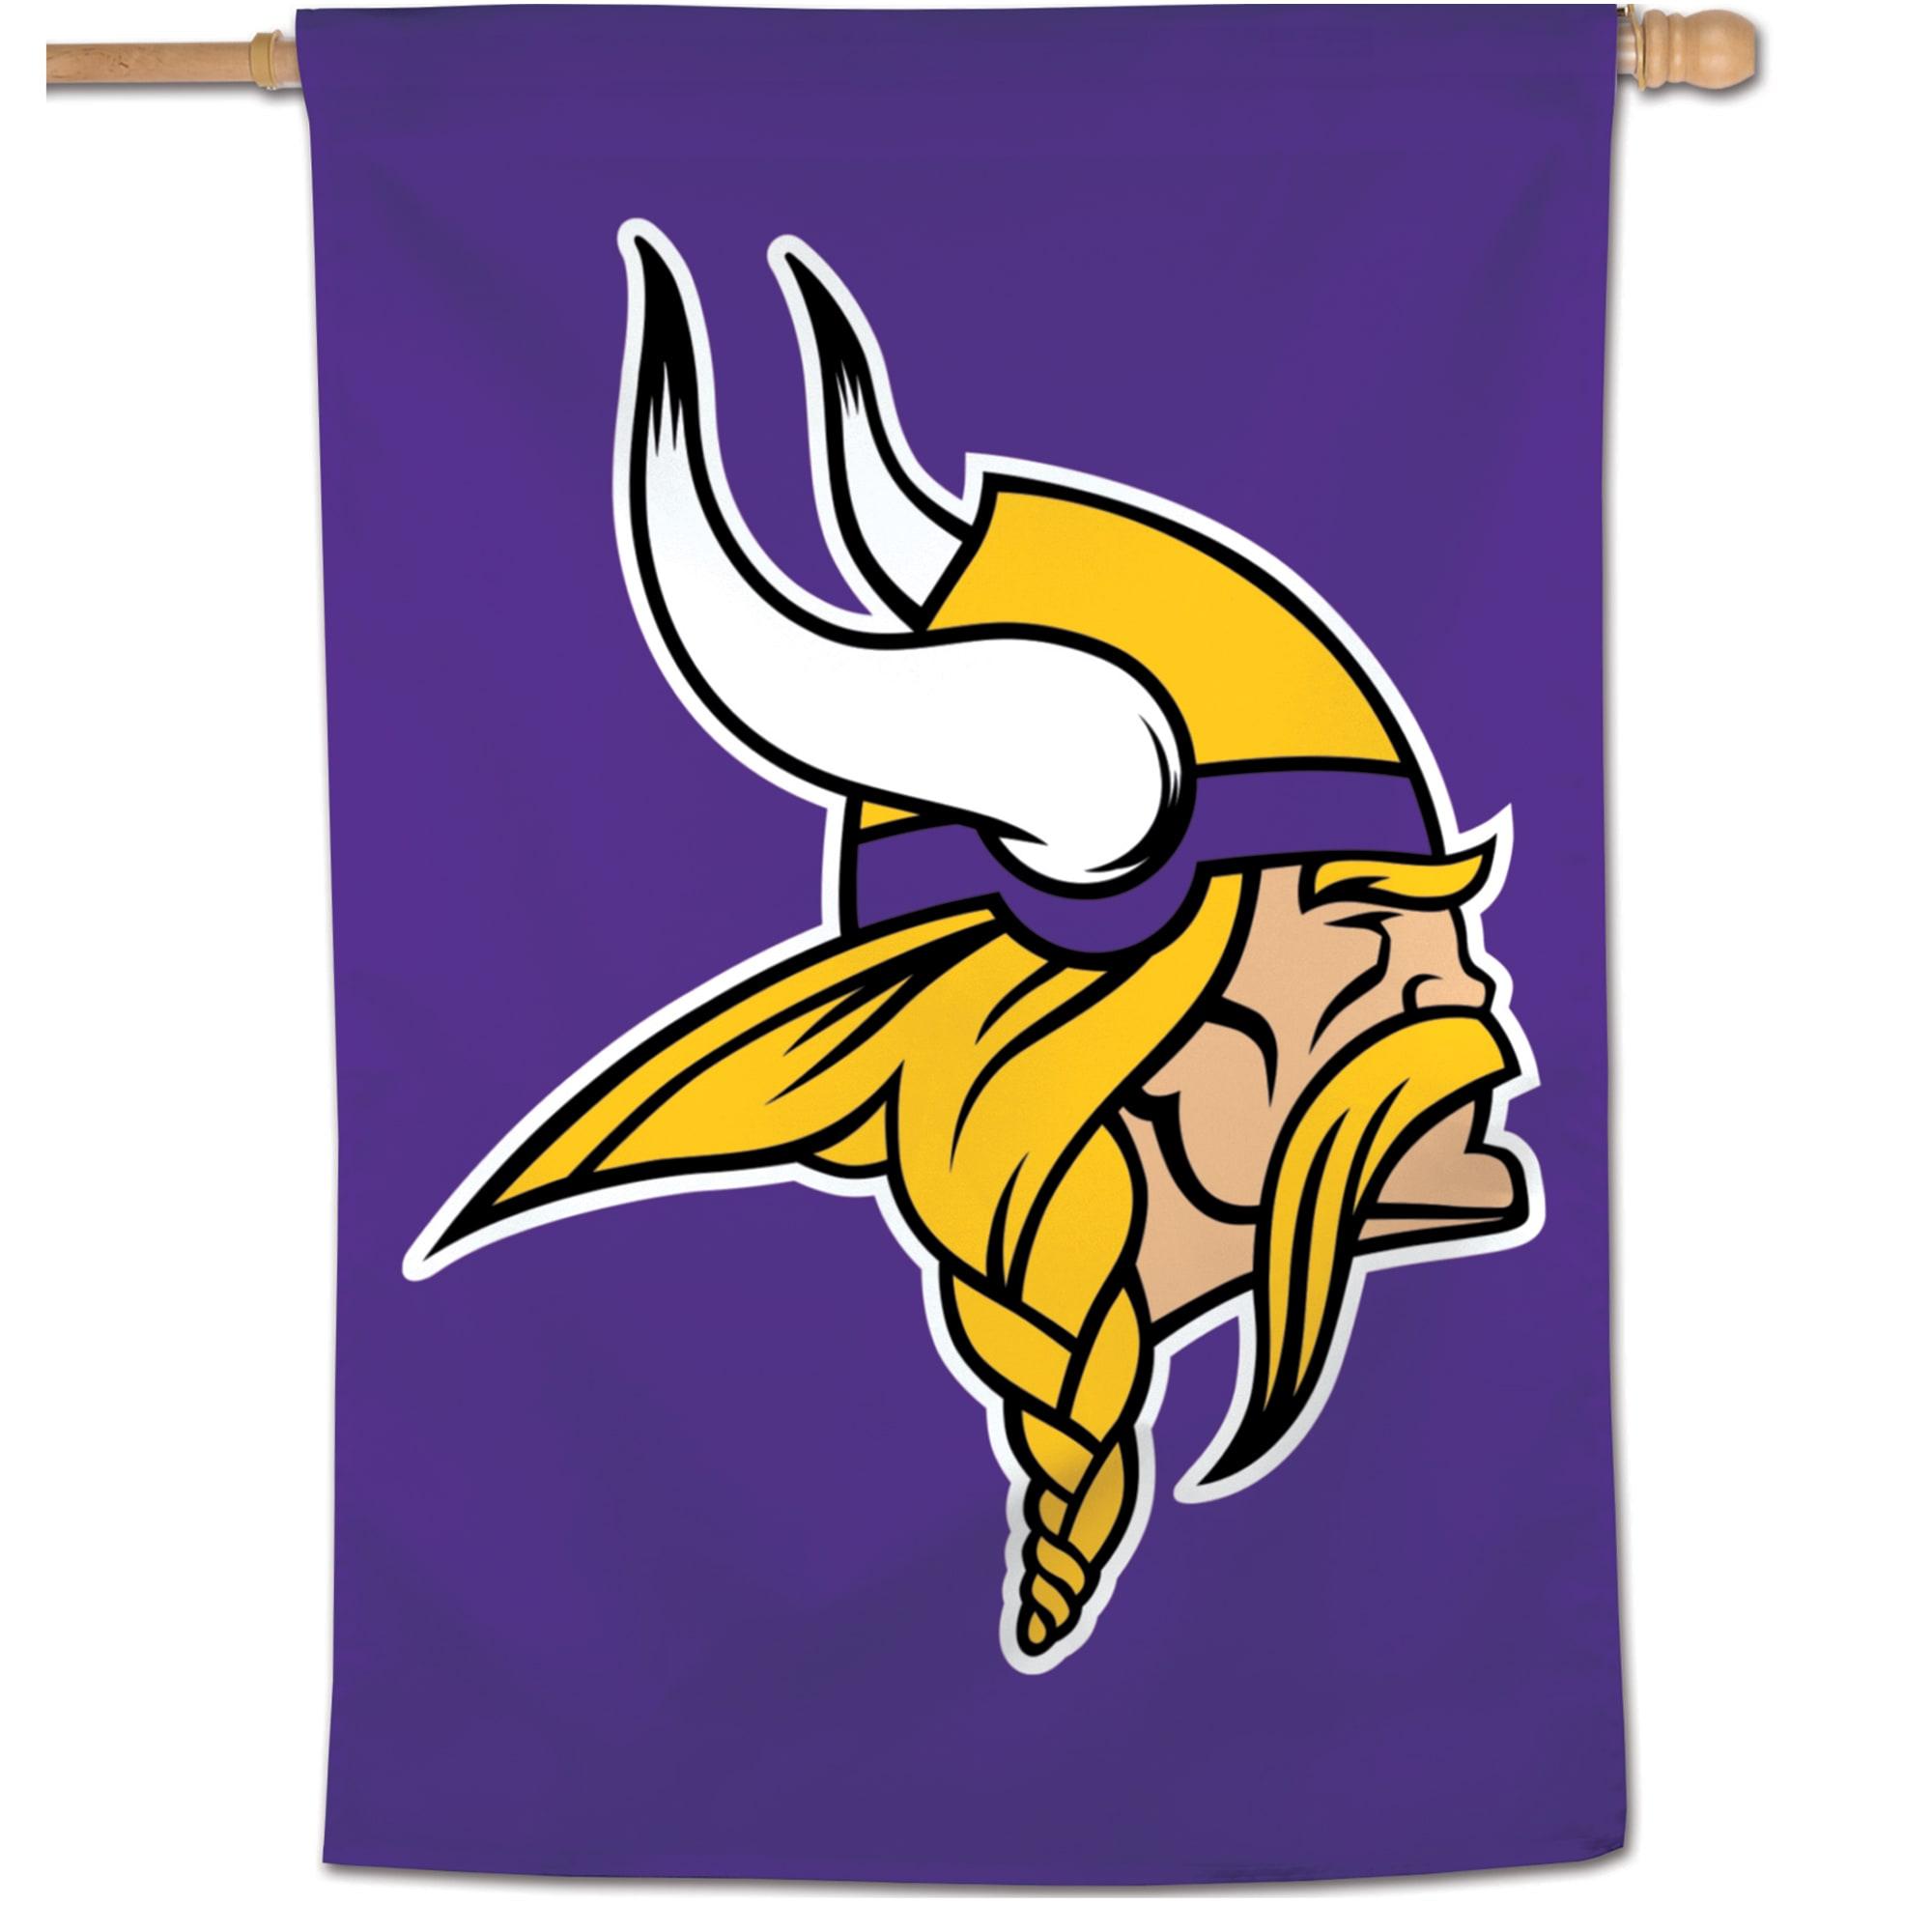 "Minnesota Vikings WinCraft 28"" x 40"" Large Logo Single-Sided Vertical Banner"